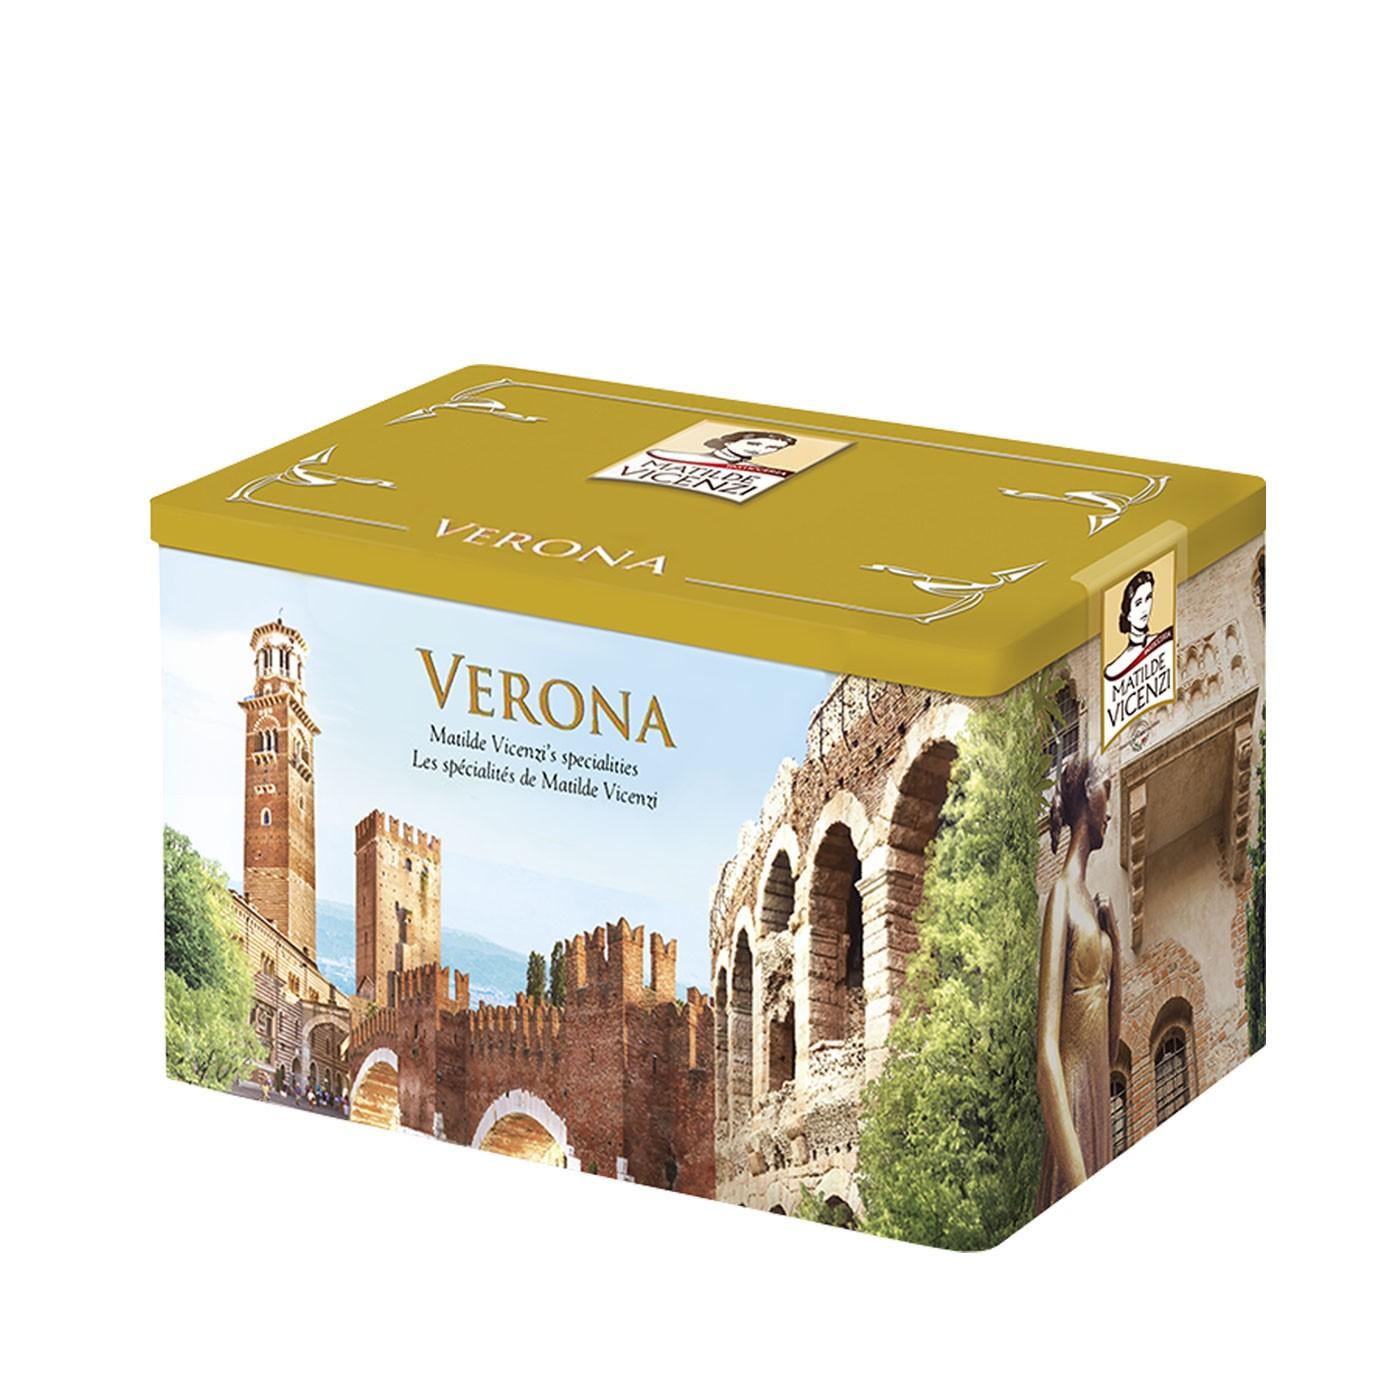 Verona Assorted Puff Pastry & Shortbreads Tin 32oz - Vicenzi   Eataly.com